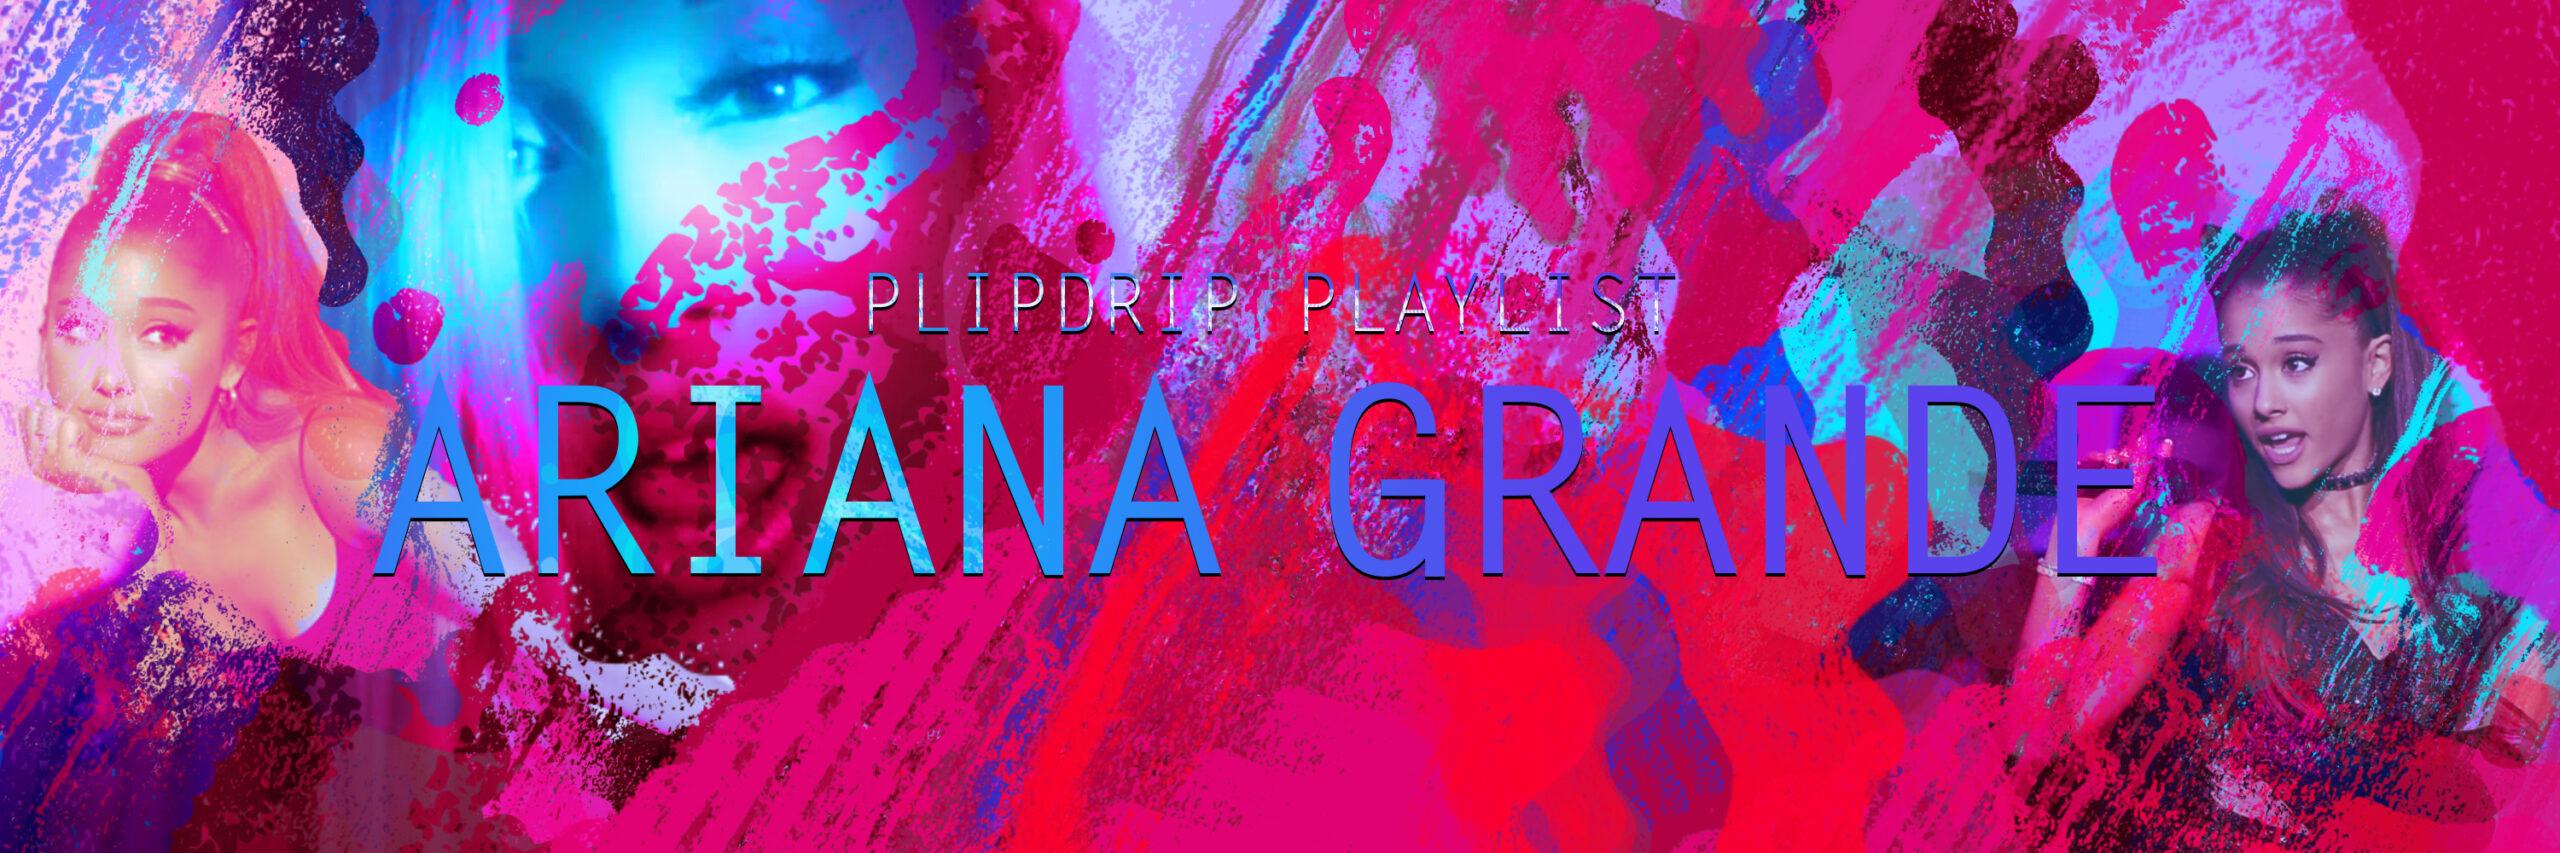 PF-ariana-grande-banner-1